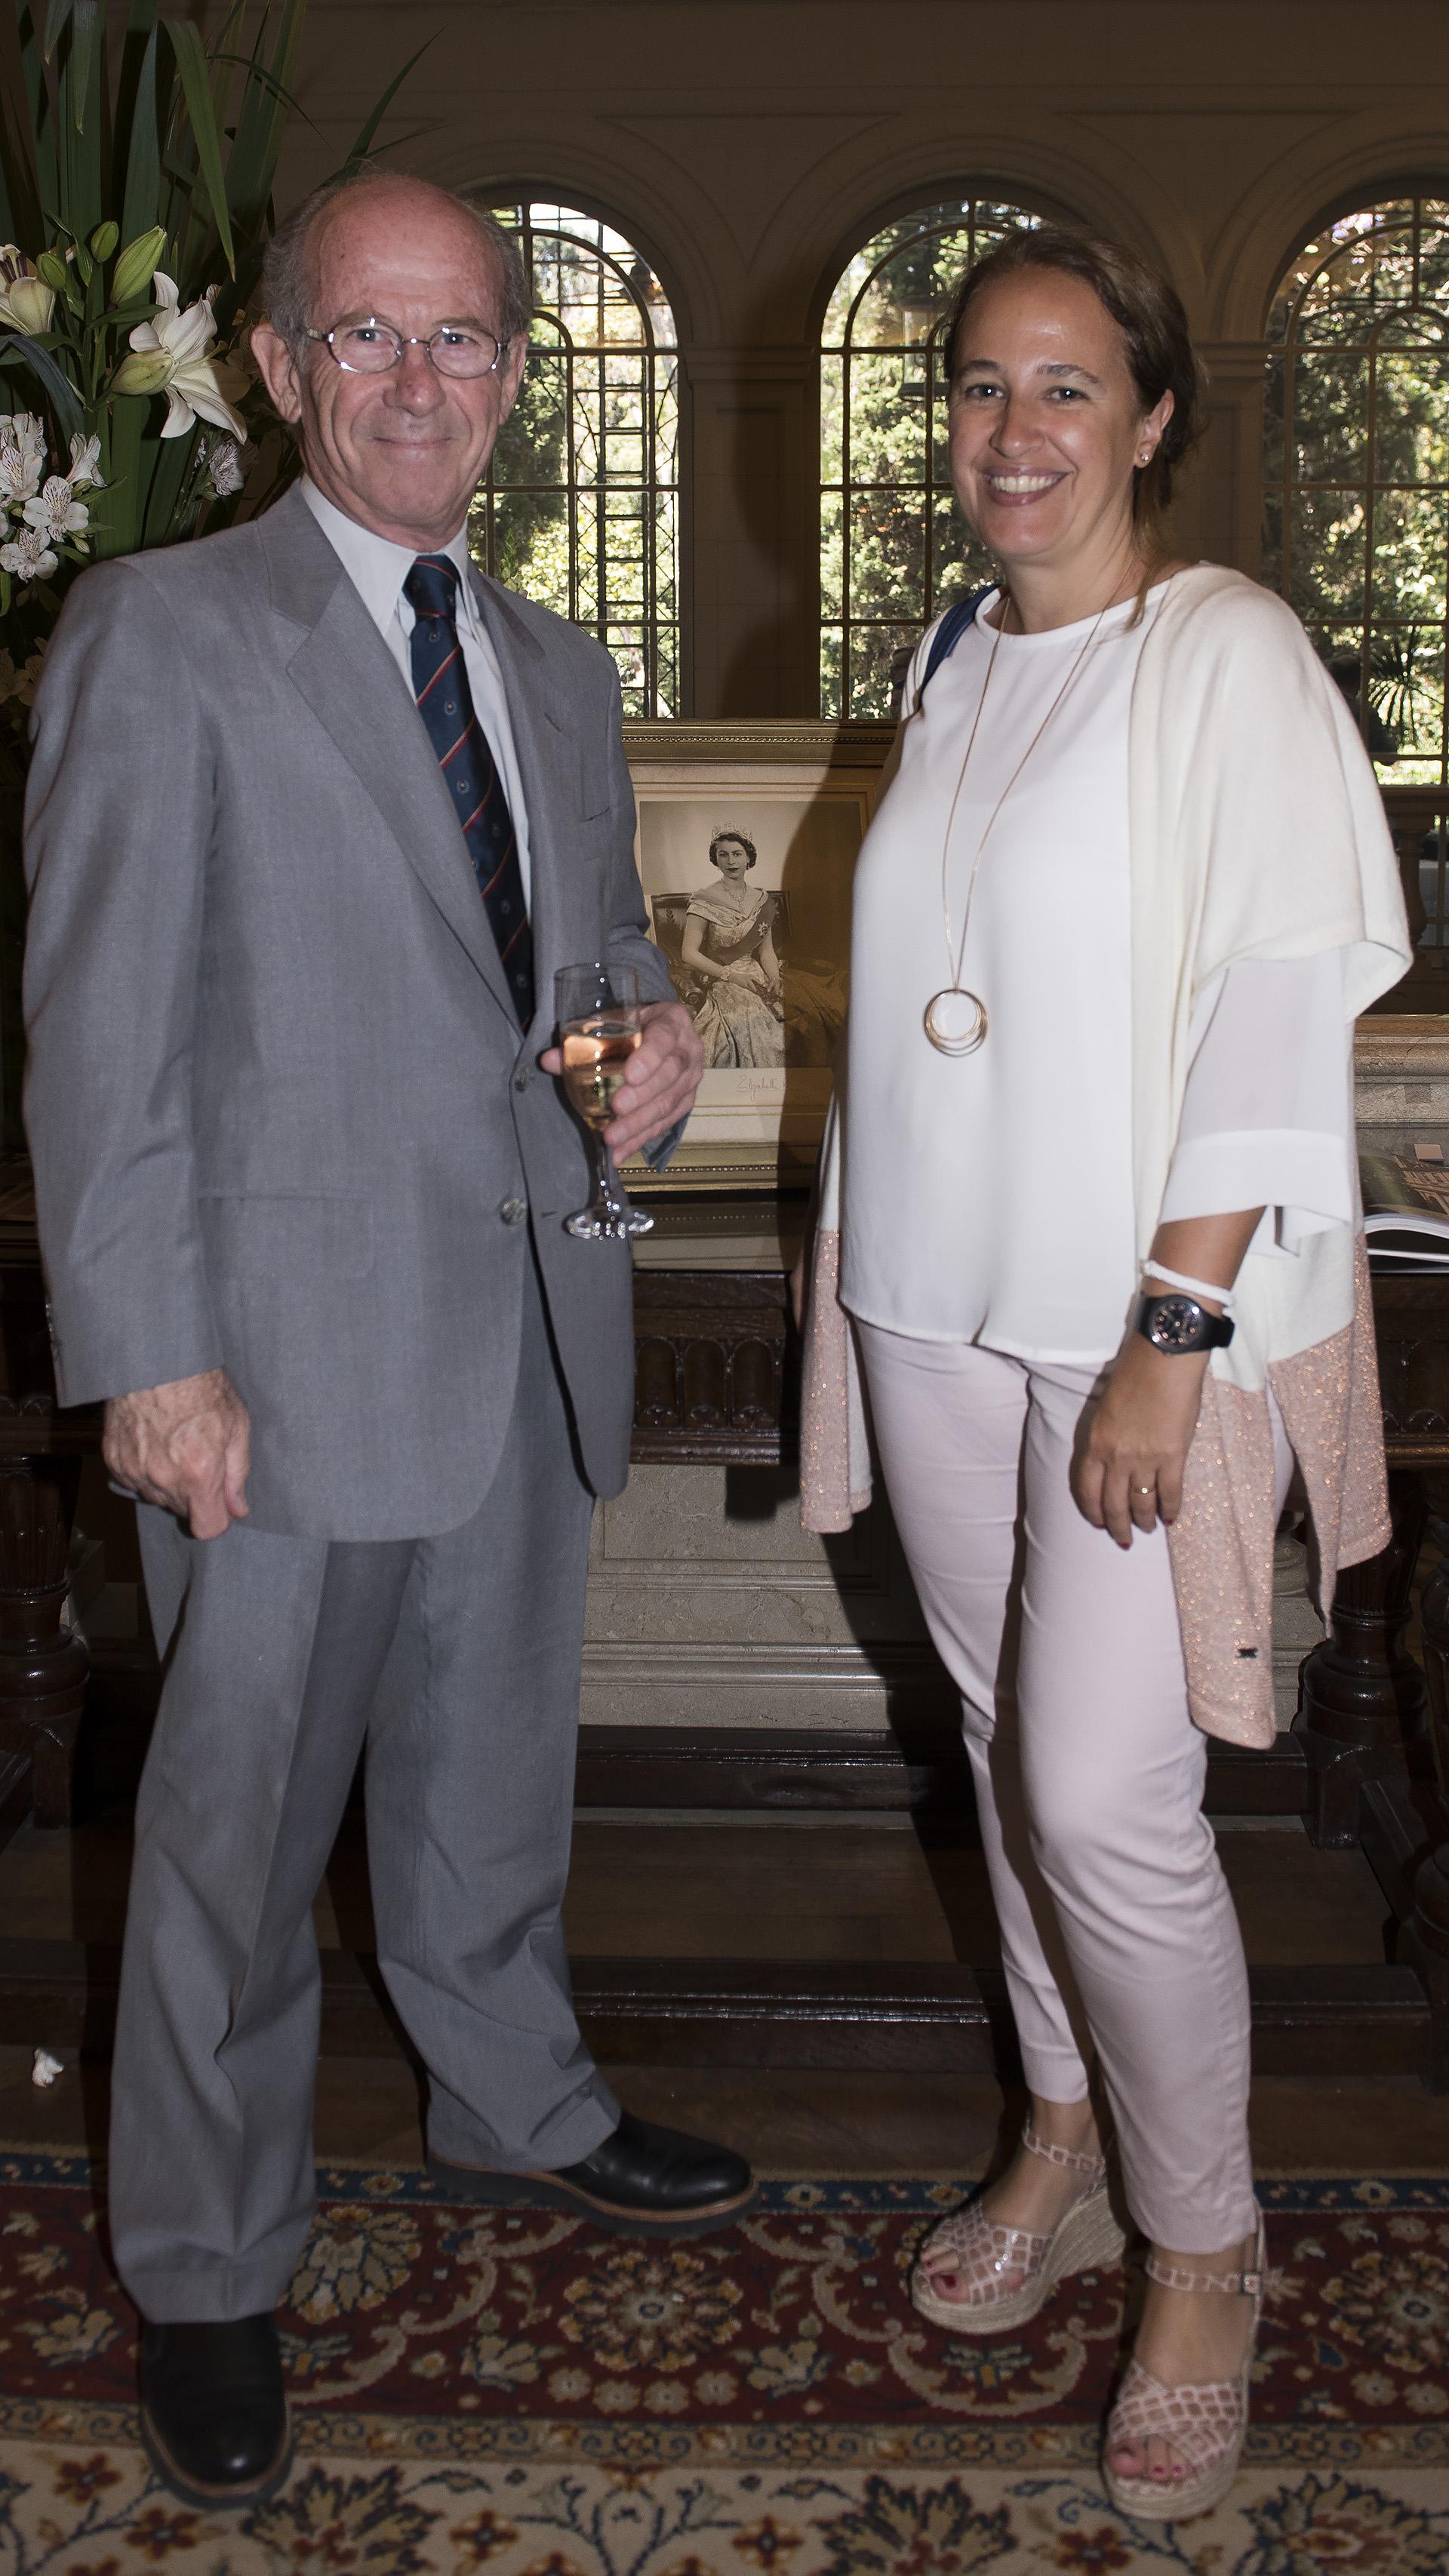 Jorge Mandelbaum, presidente de CIPPEC, y Mercedes Méndez Ribas, directora de Desarrollo Institucional de CIPPEC